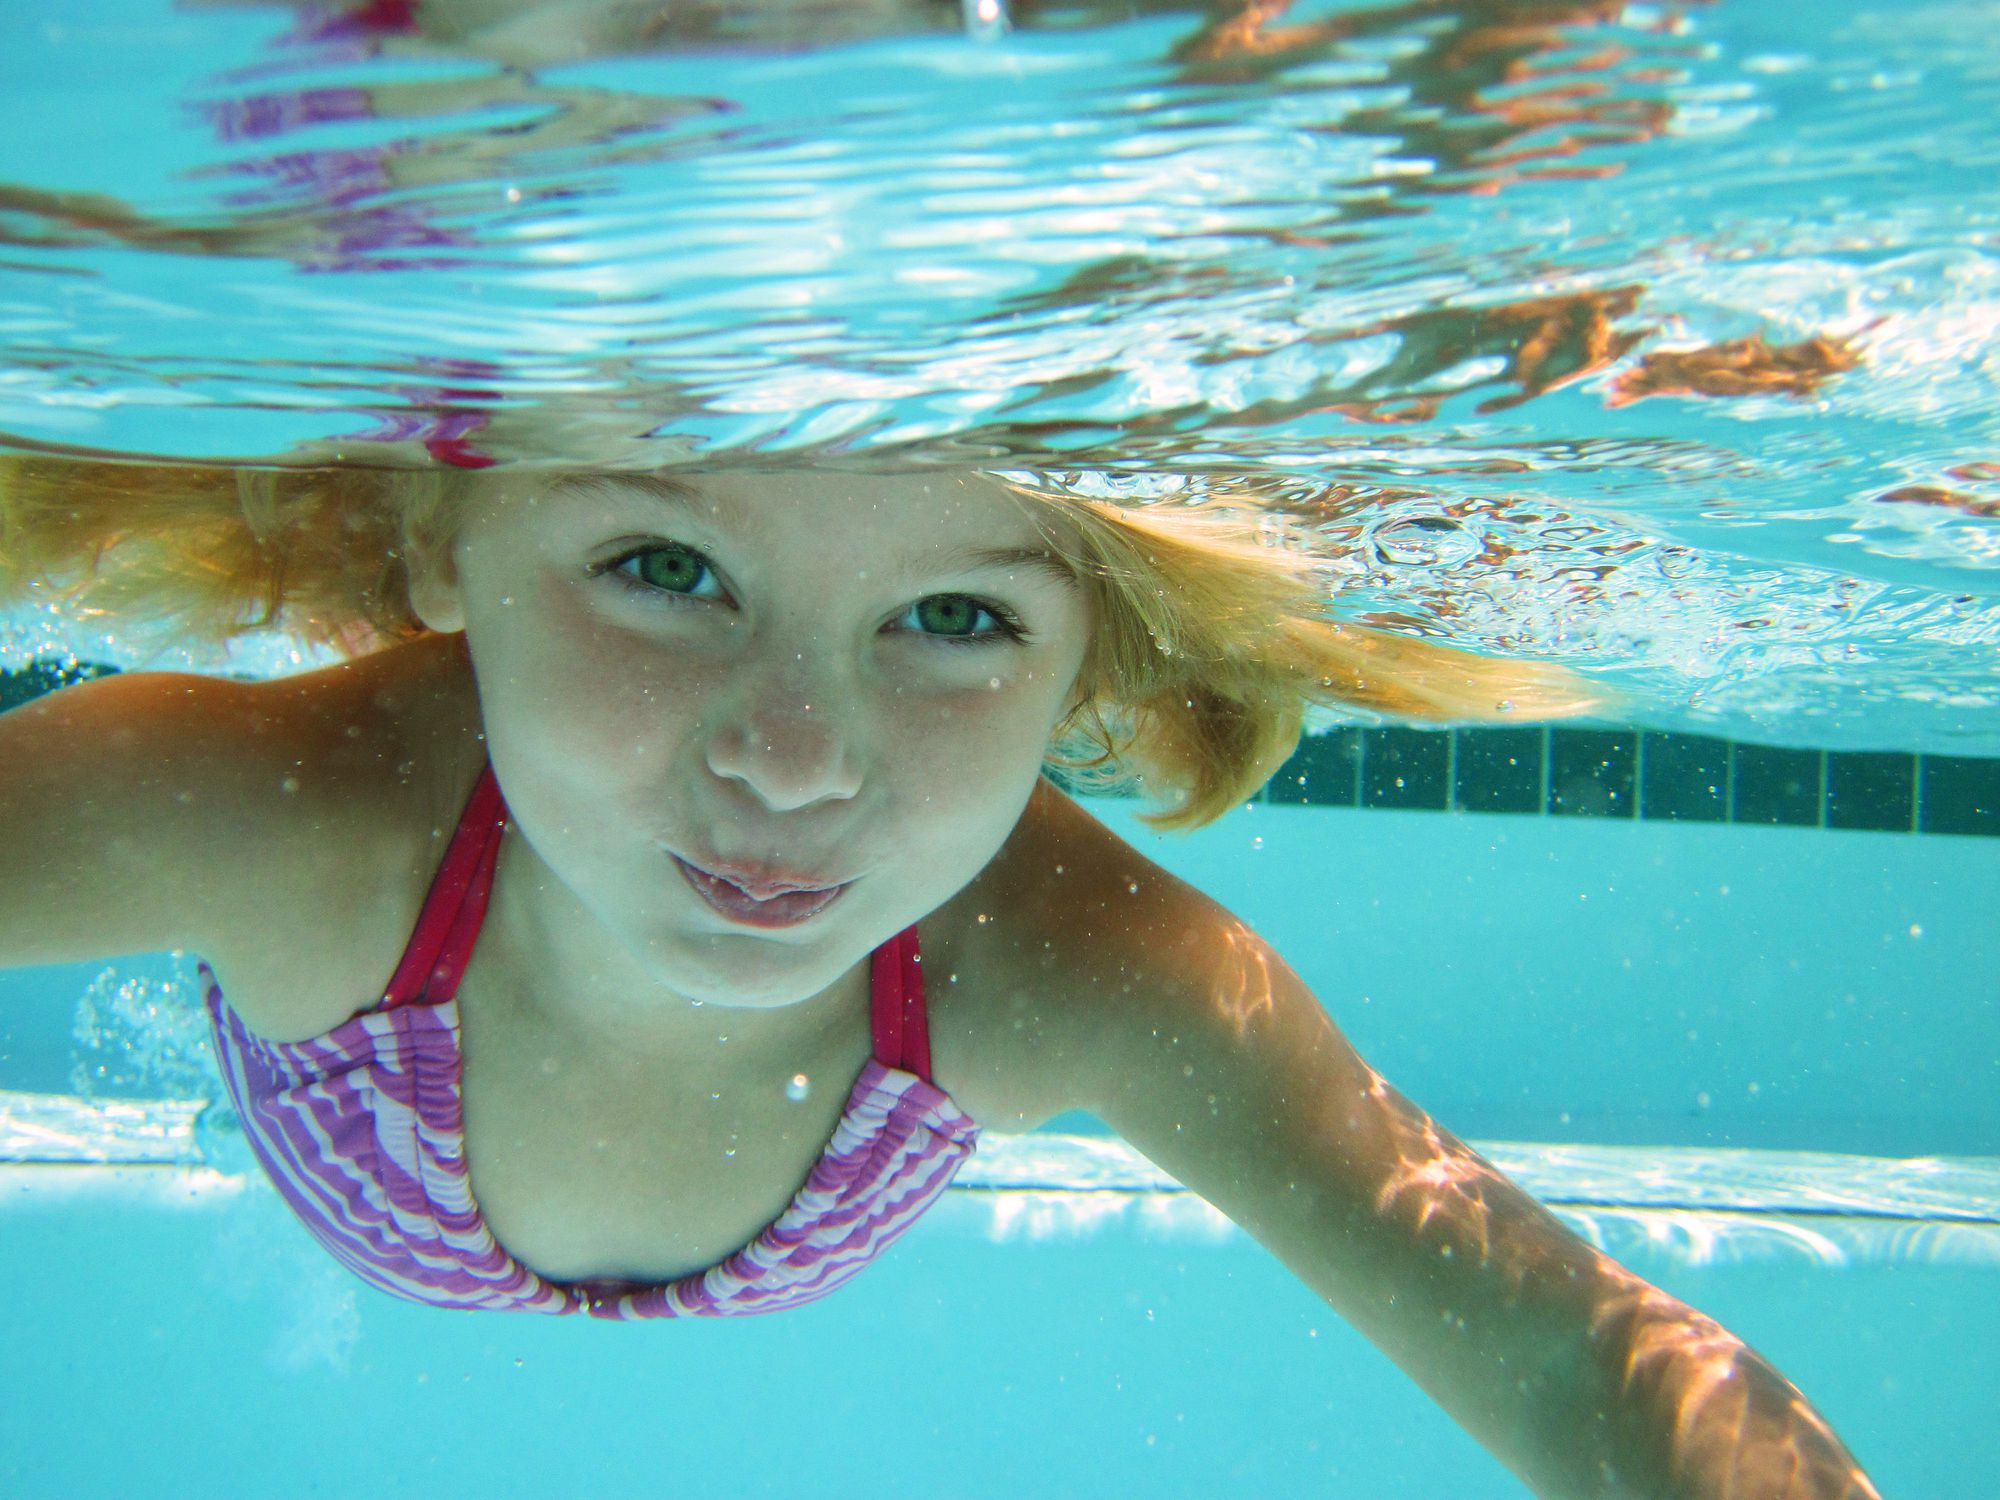 Swimming while black